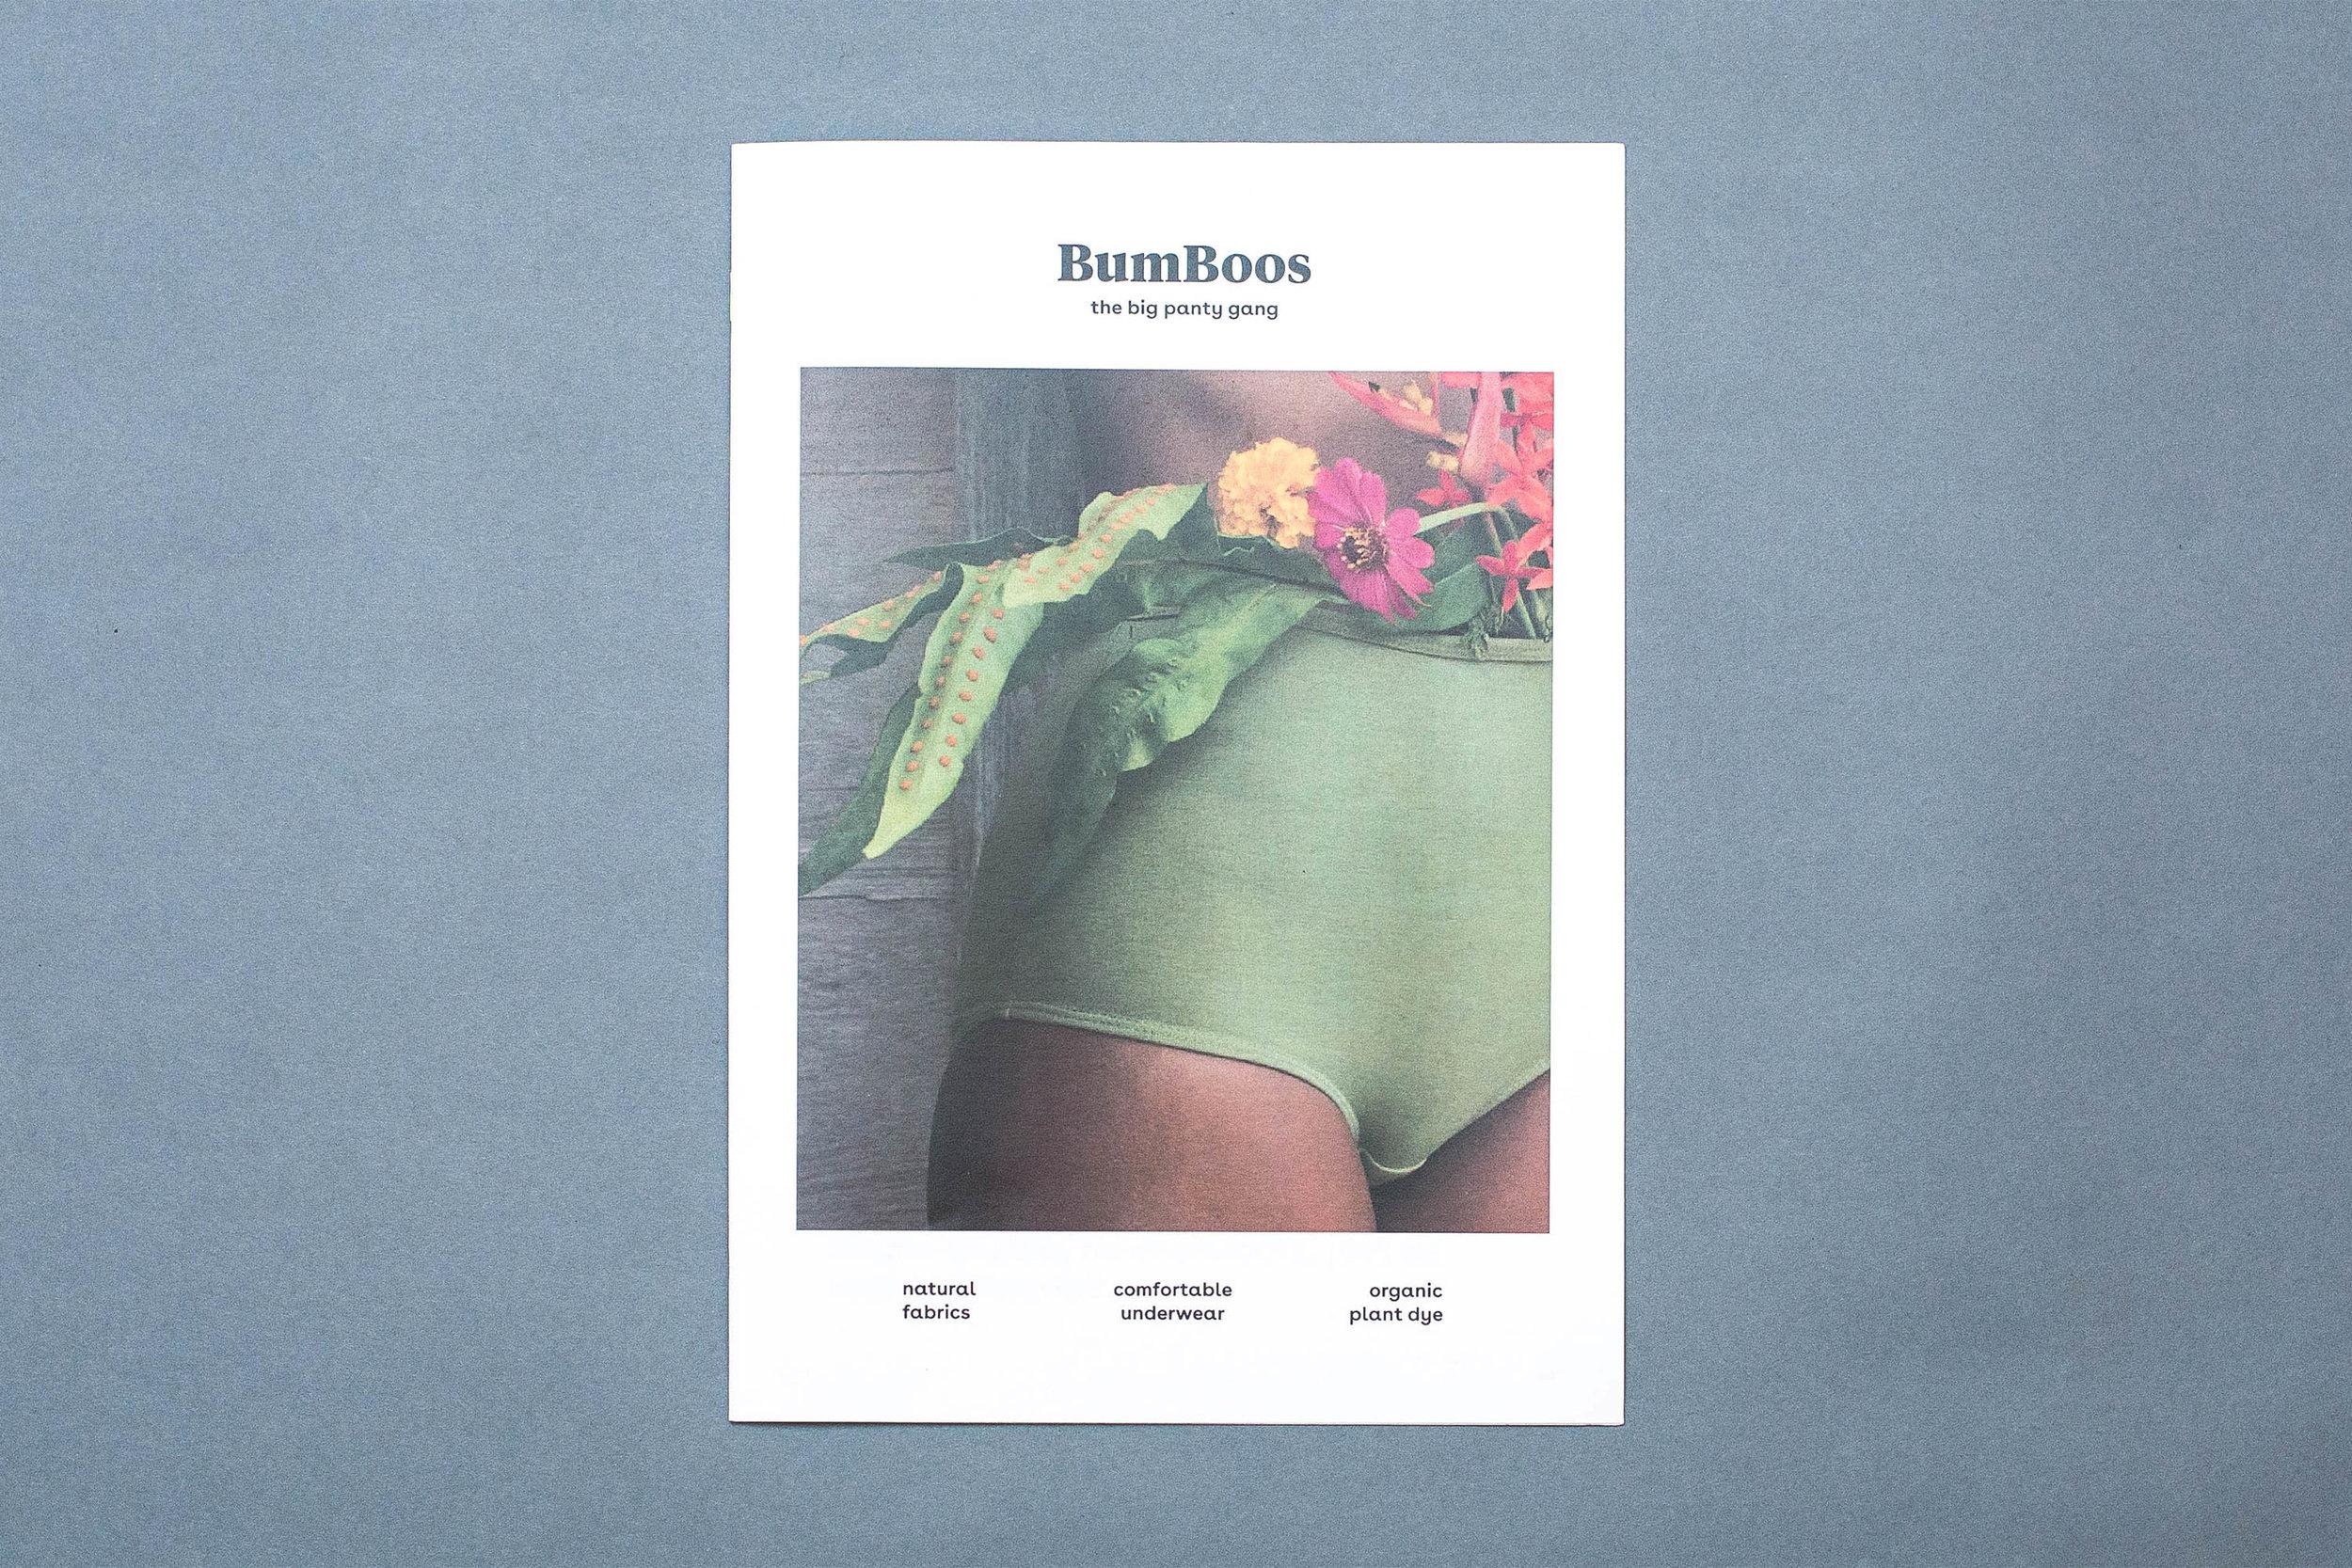 bumboos_9.jpg